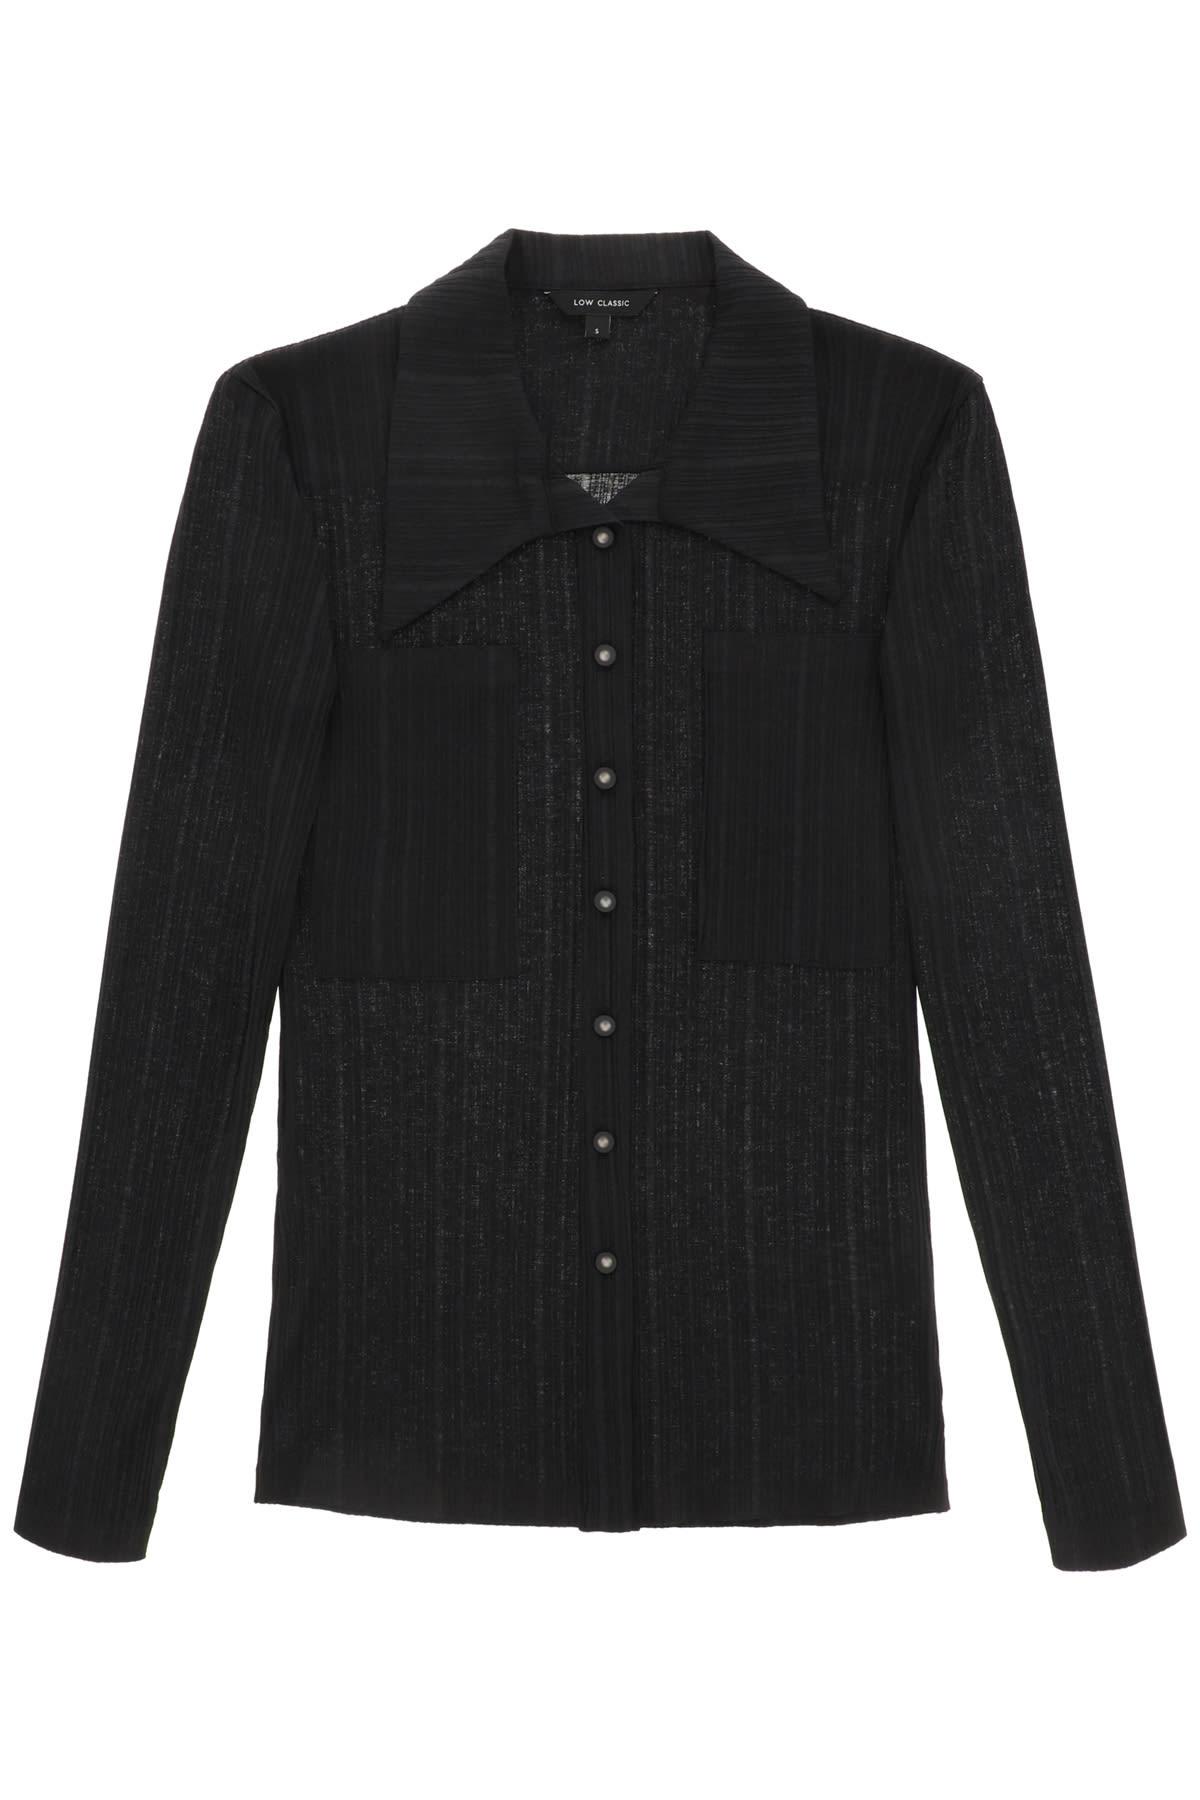 Low Classic Shirts STRETCH KNIT SHIRT